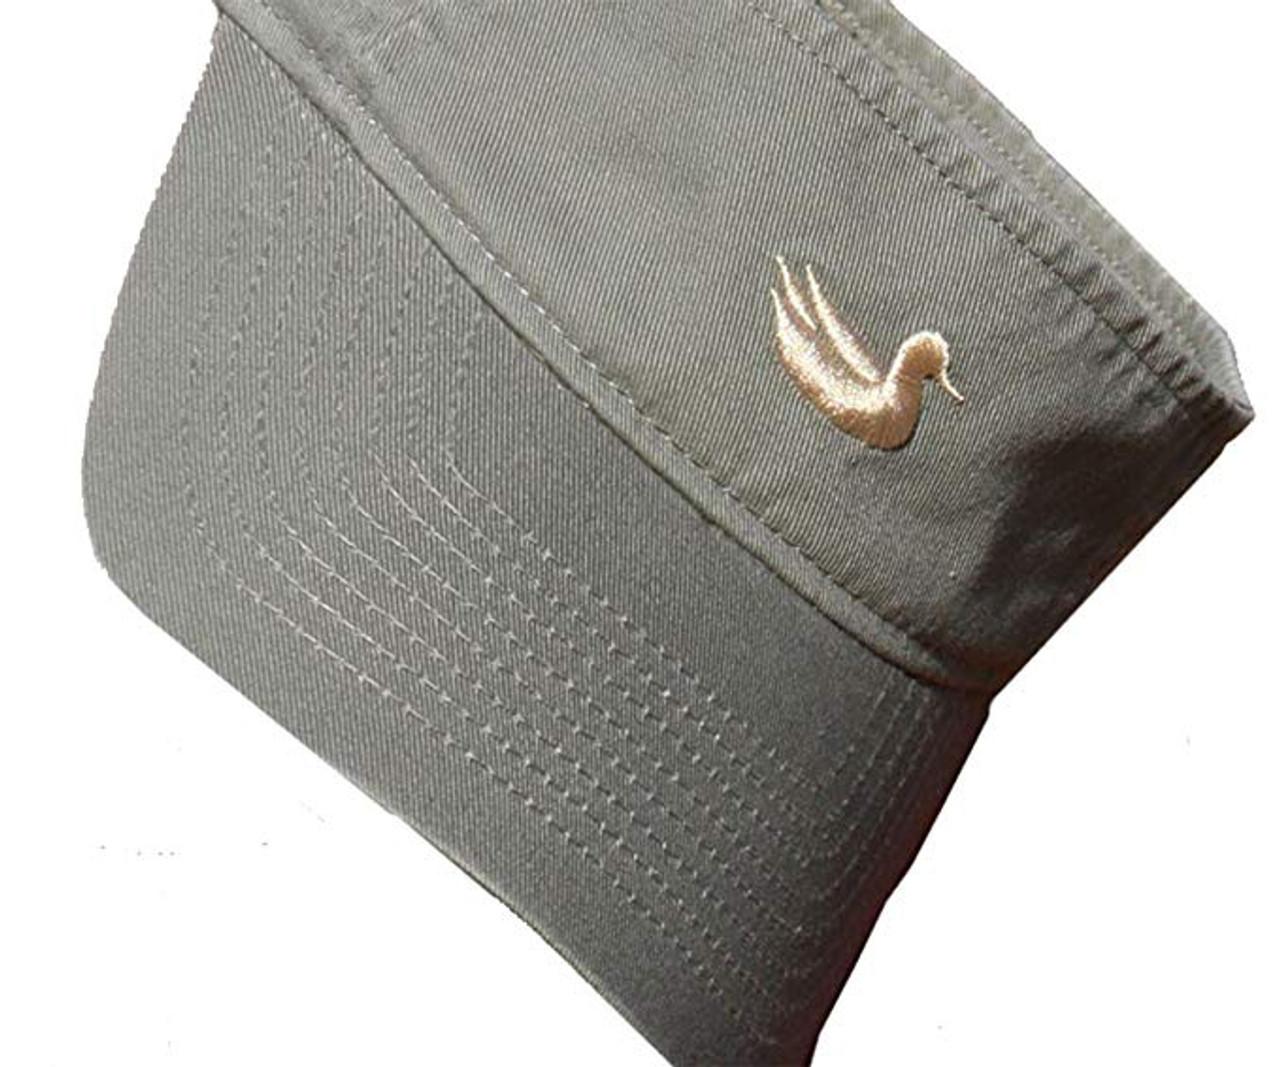 ba6106e3d78c6 Southern Marsh Visor - Trenz Shirt Company